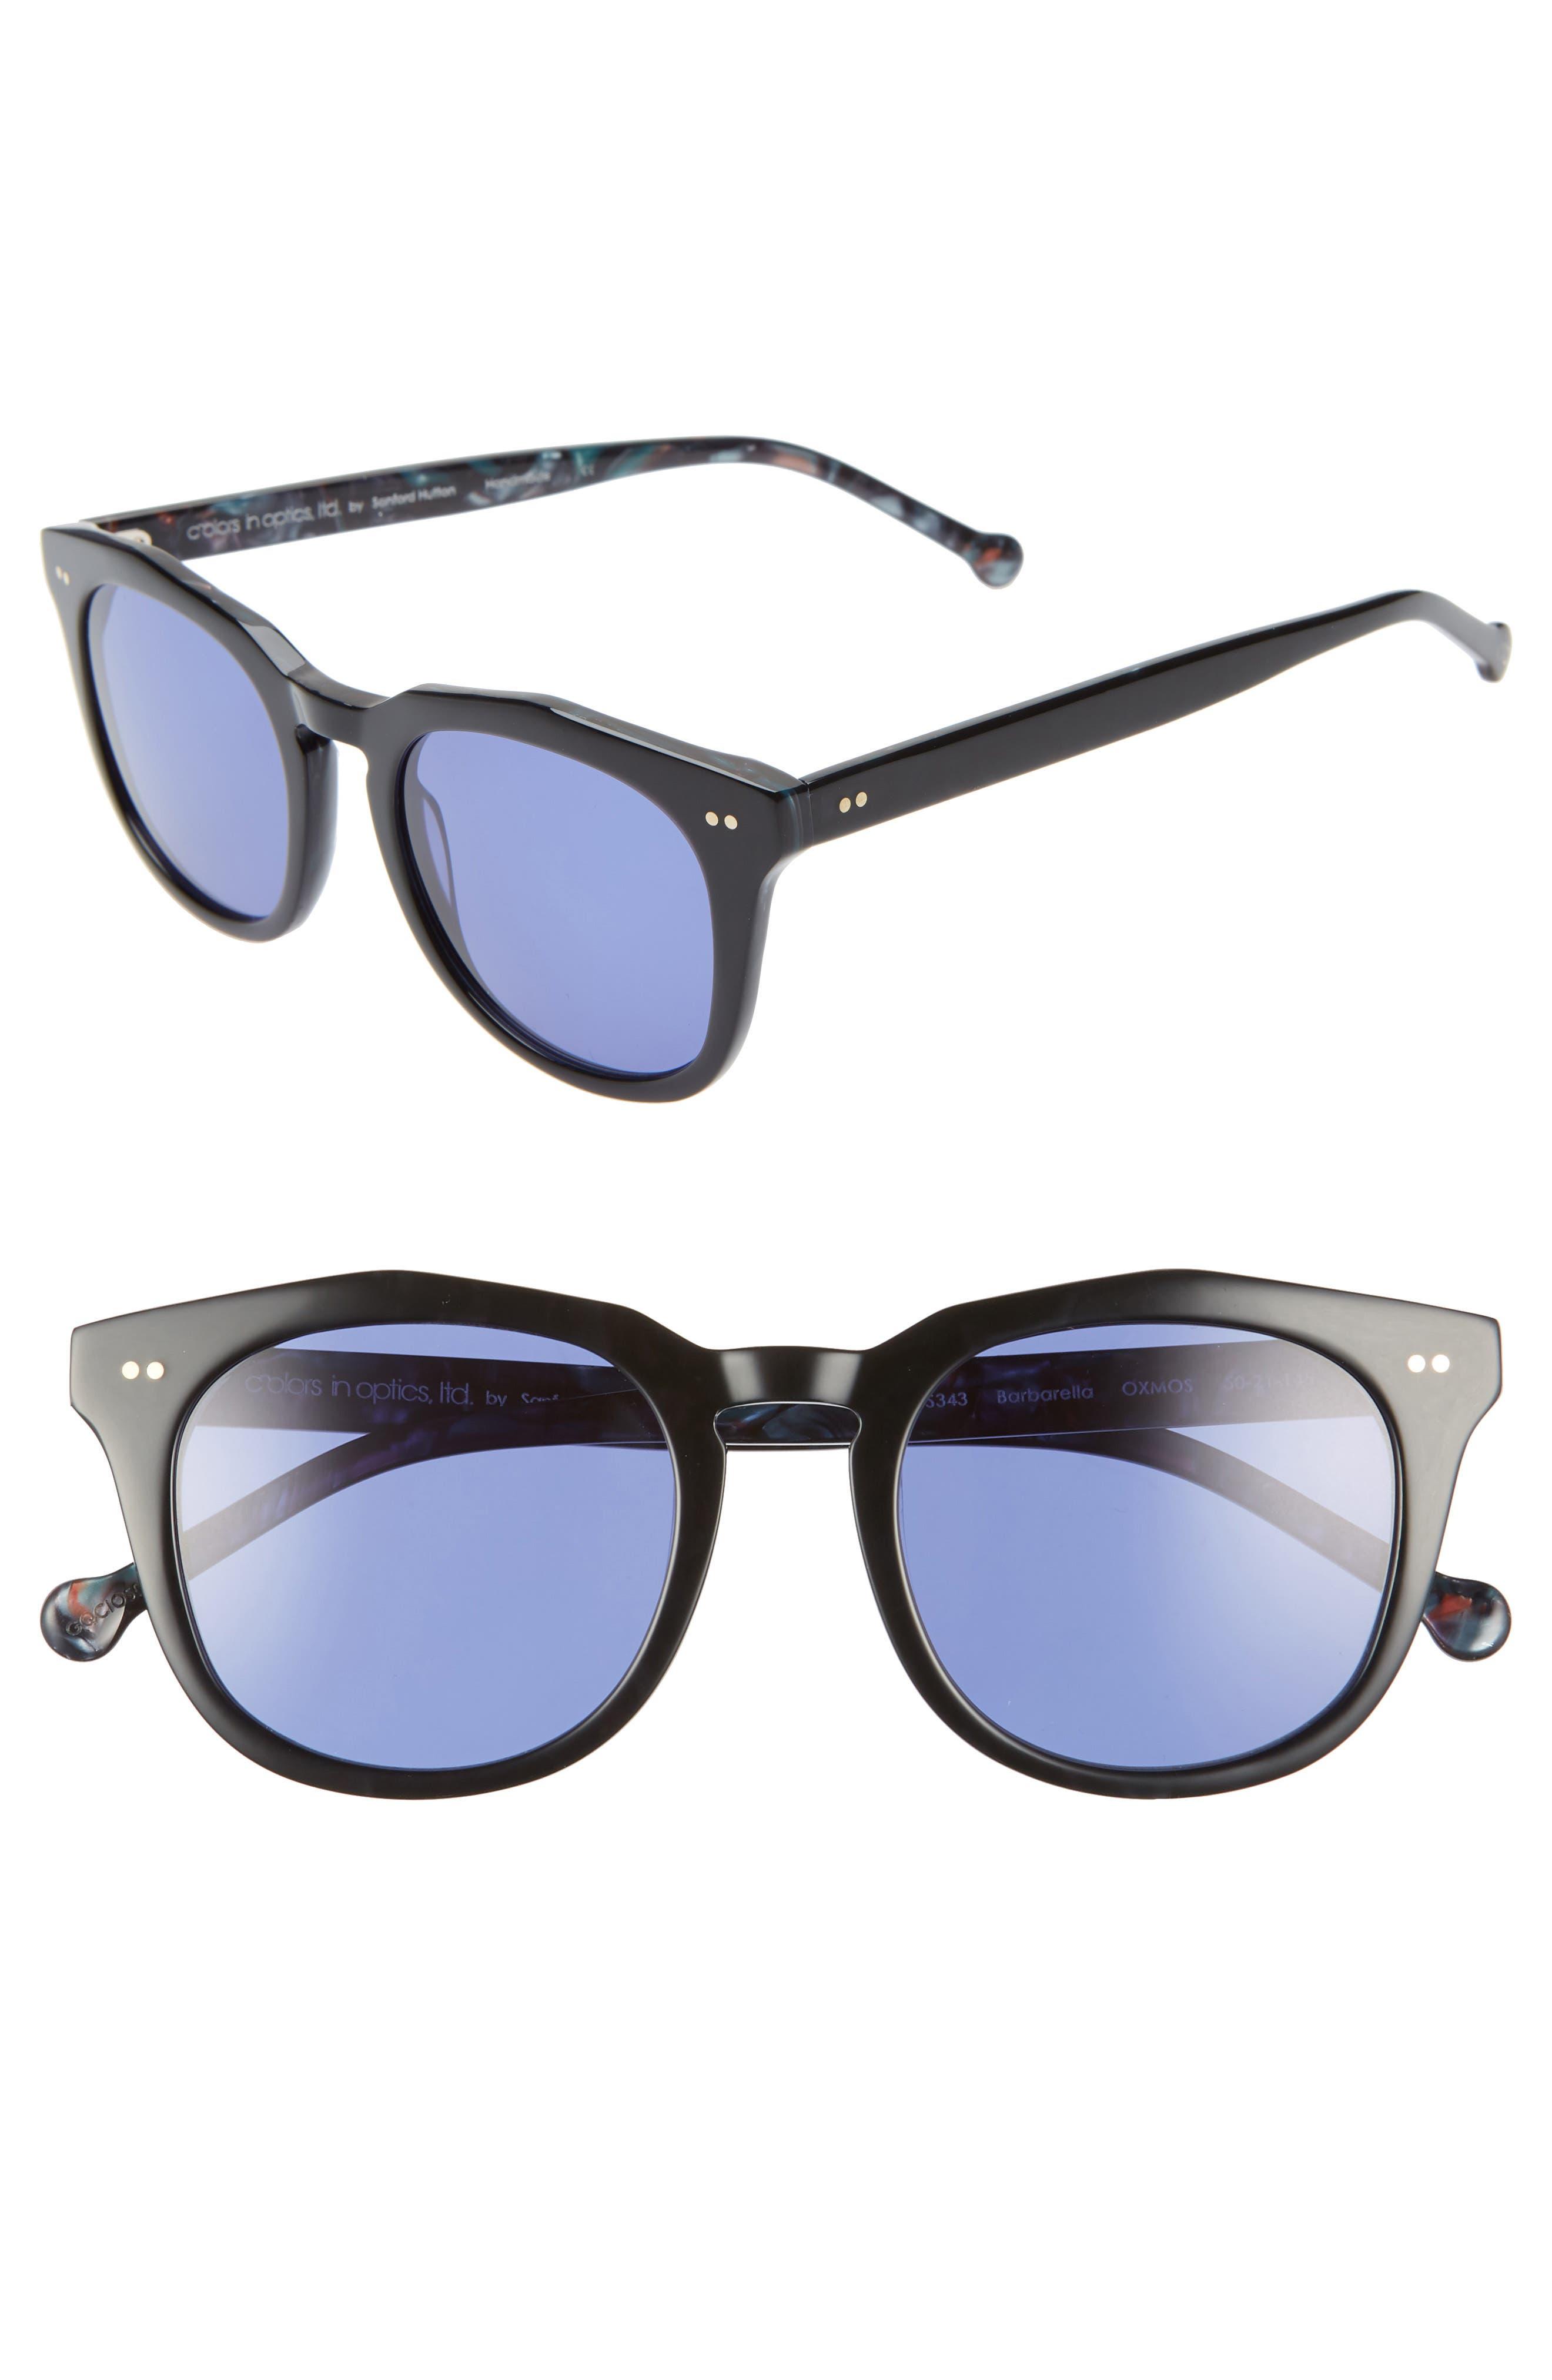 7b9a13eab Colors In Optics Sunglasses for Women | Nordstrom